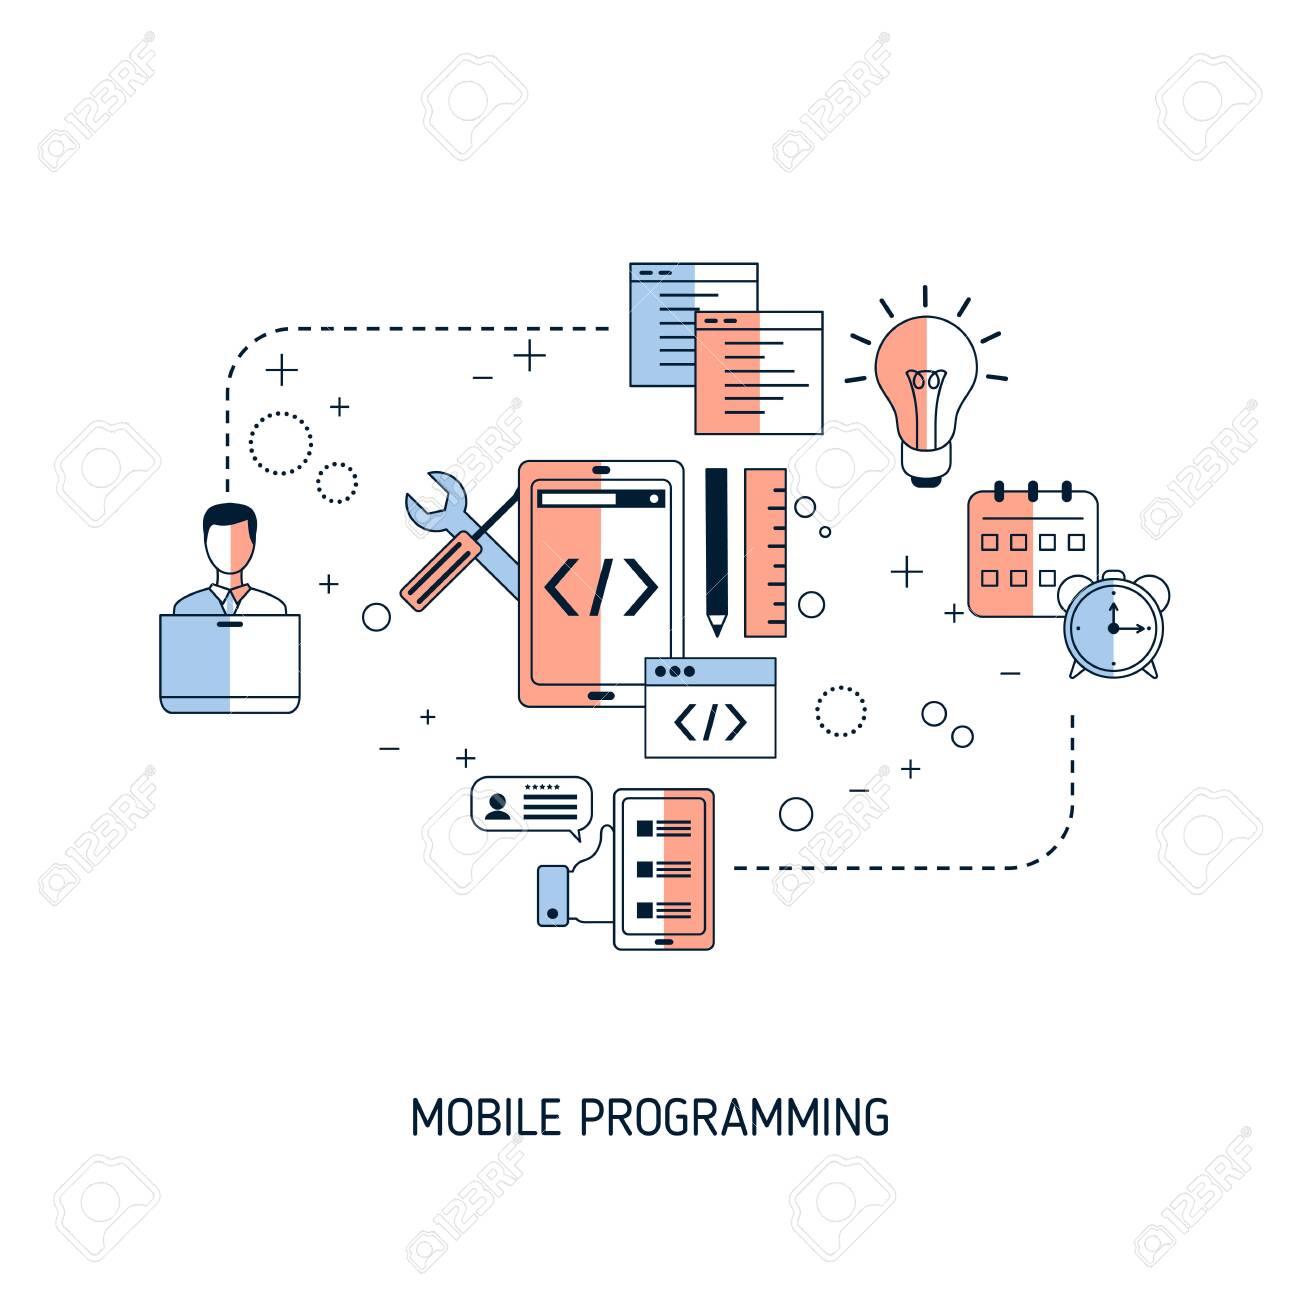 Mobile programming concept. Vector illustration for website, app, banner, etc. - 146287328